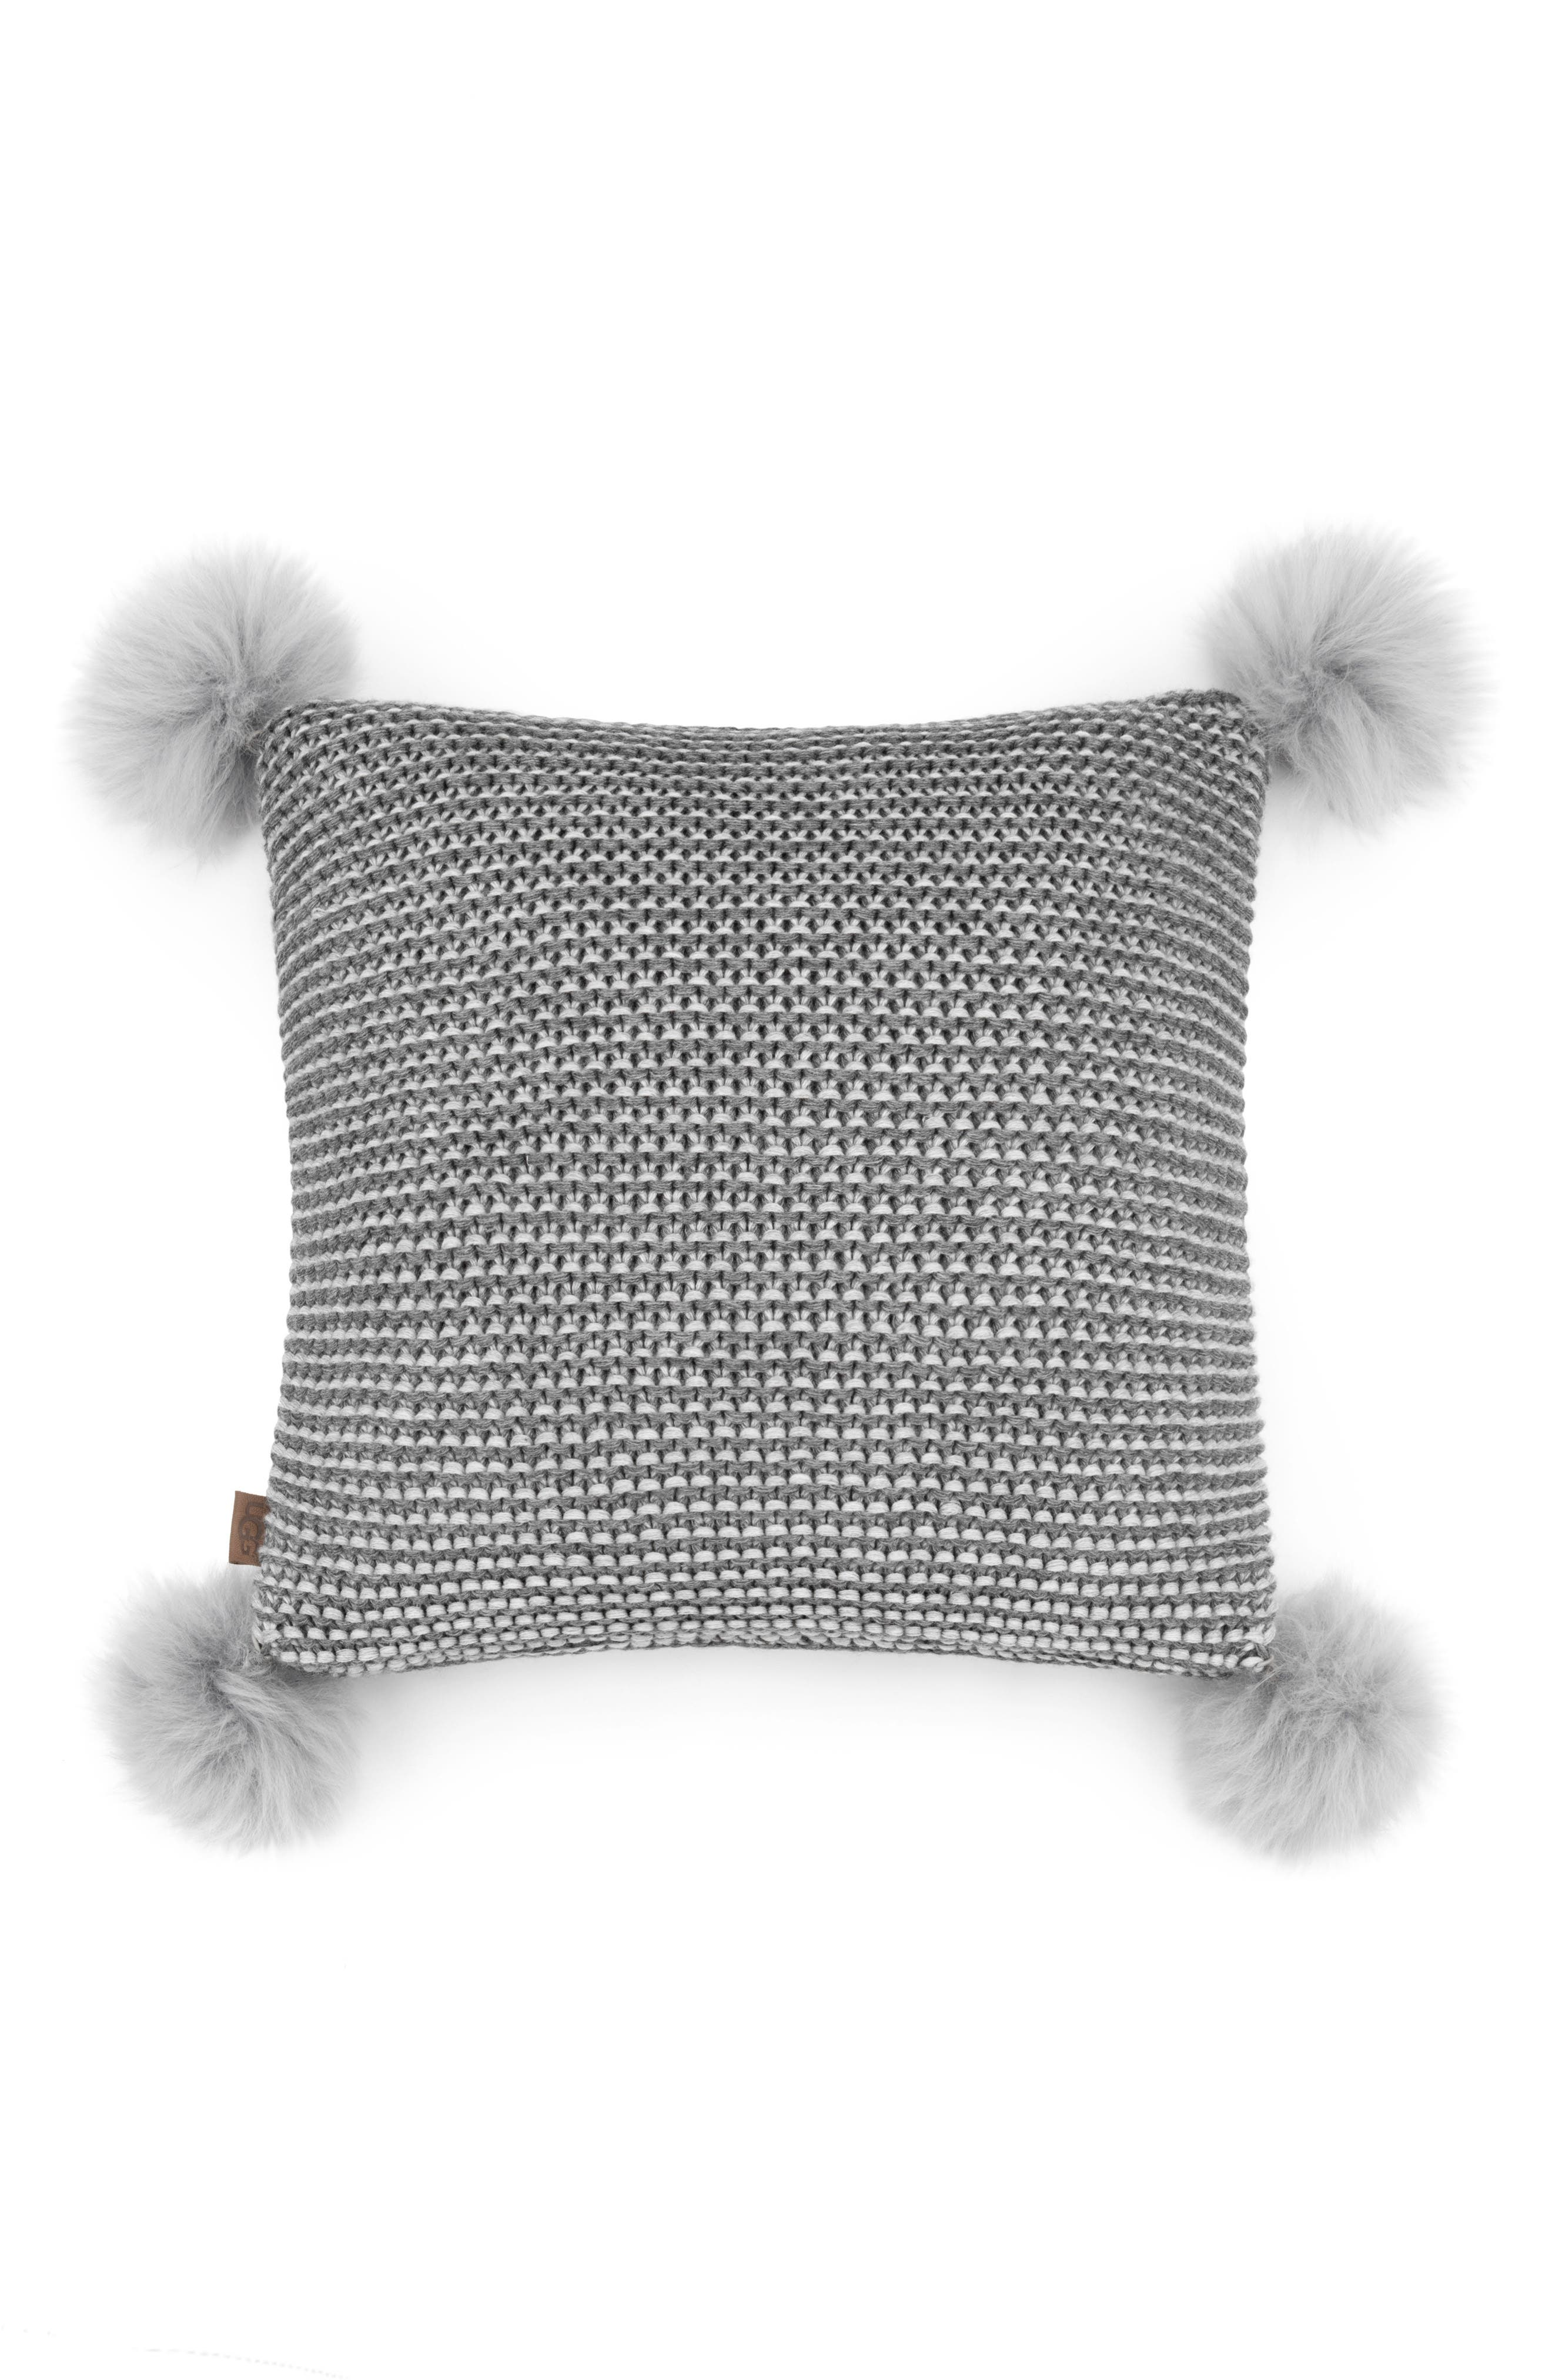 Main Image - UGG® Snow Creek Genuine Shearling Pillow